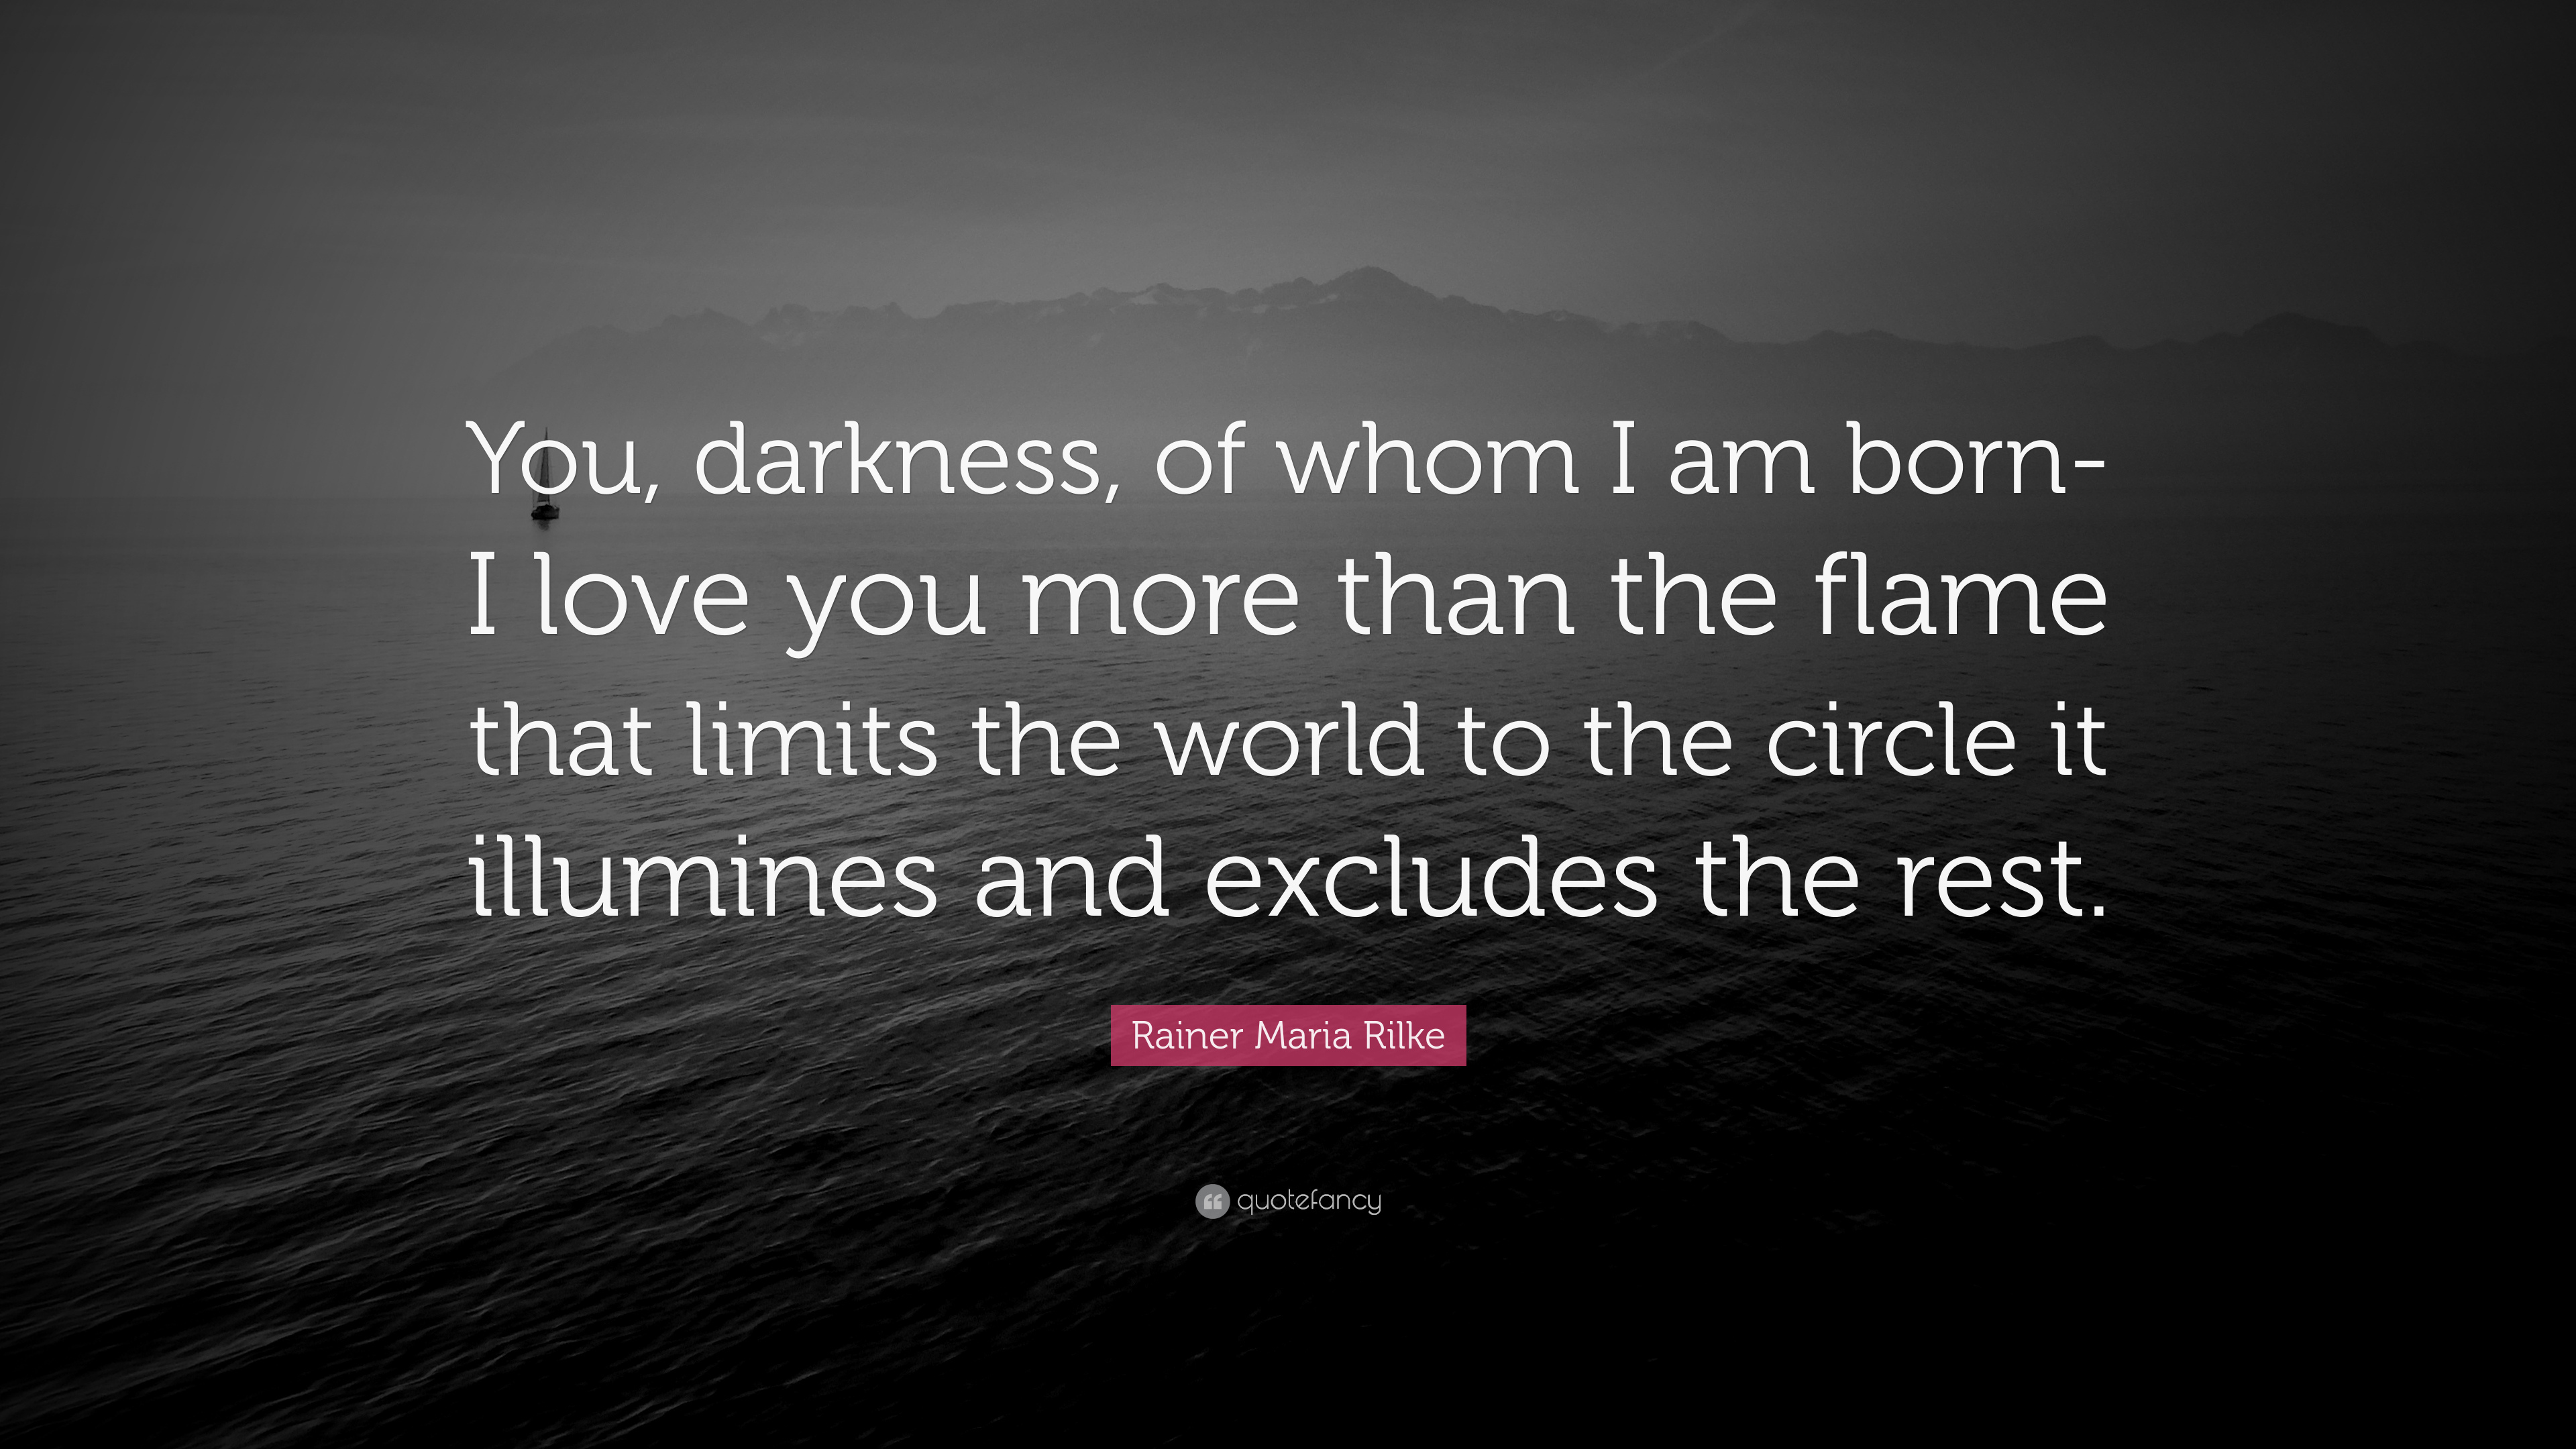 Rainer Maria Rilke Quote You Darkness Of Whom I Am Born I Love